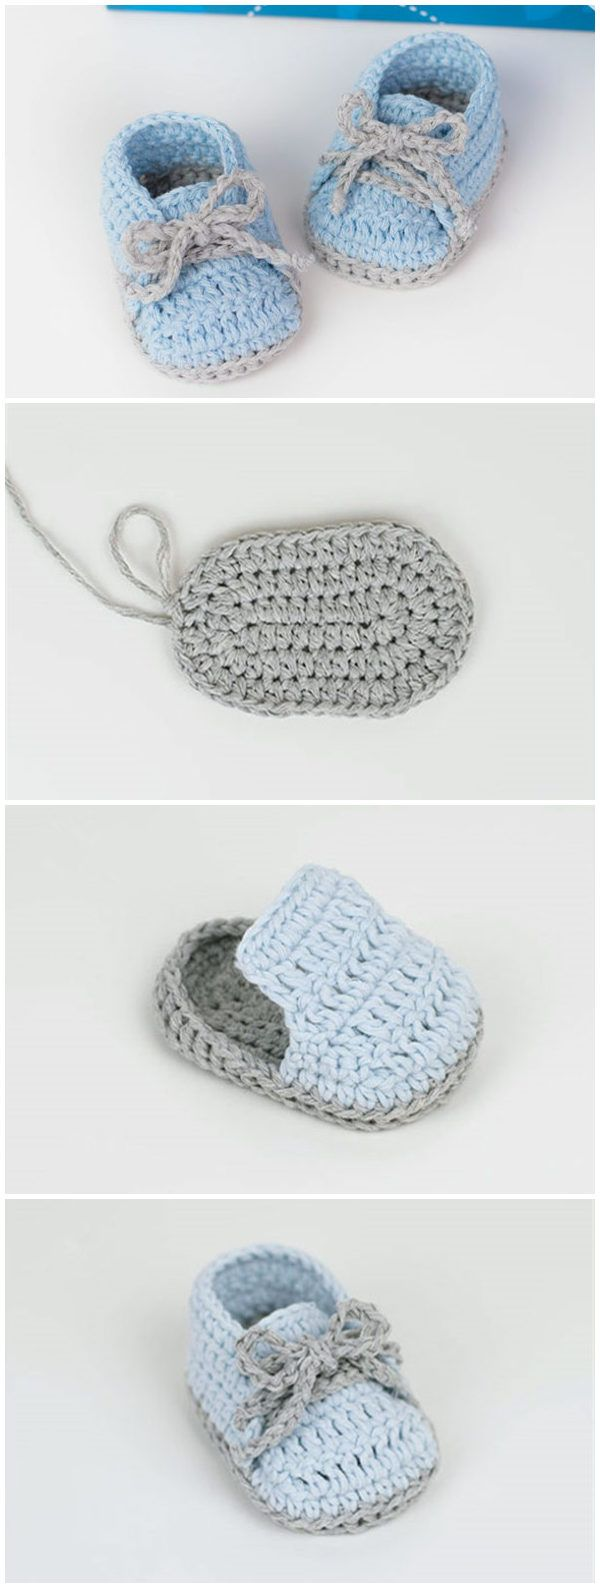 Crochet Baby Sneakers Free Pattern | gilet sans manches bébé ...